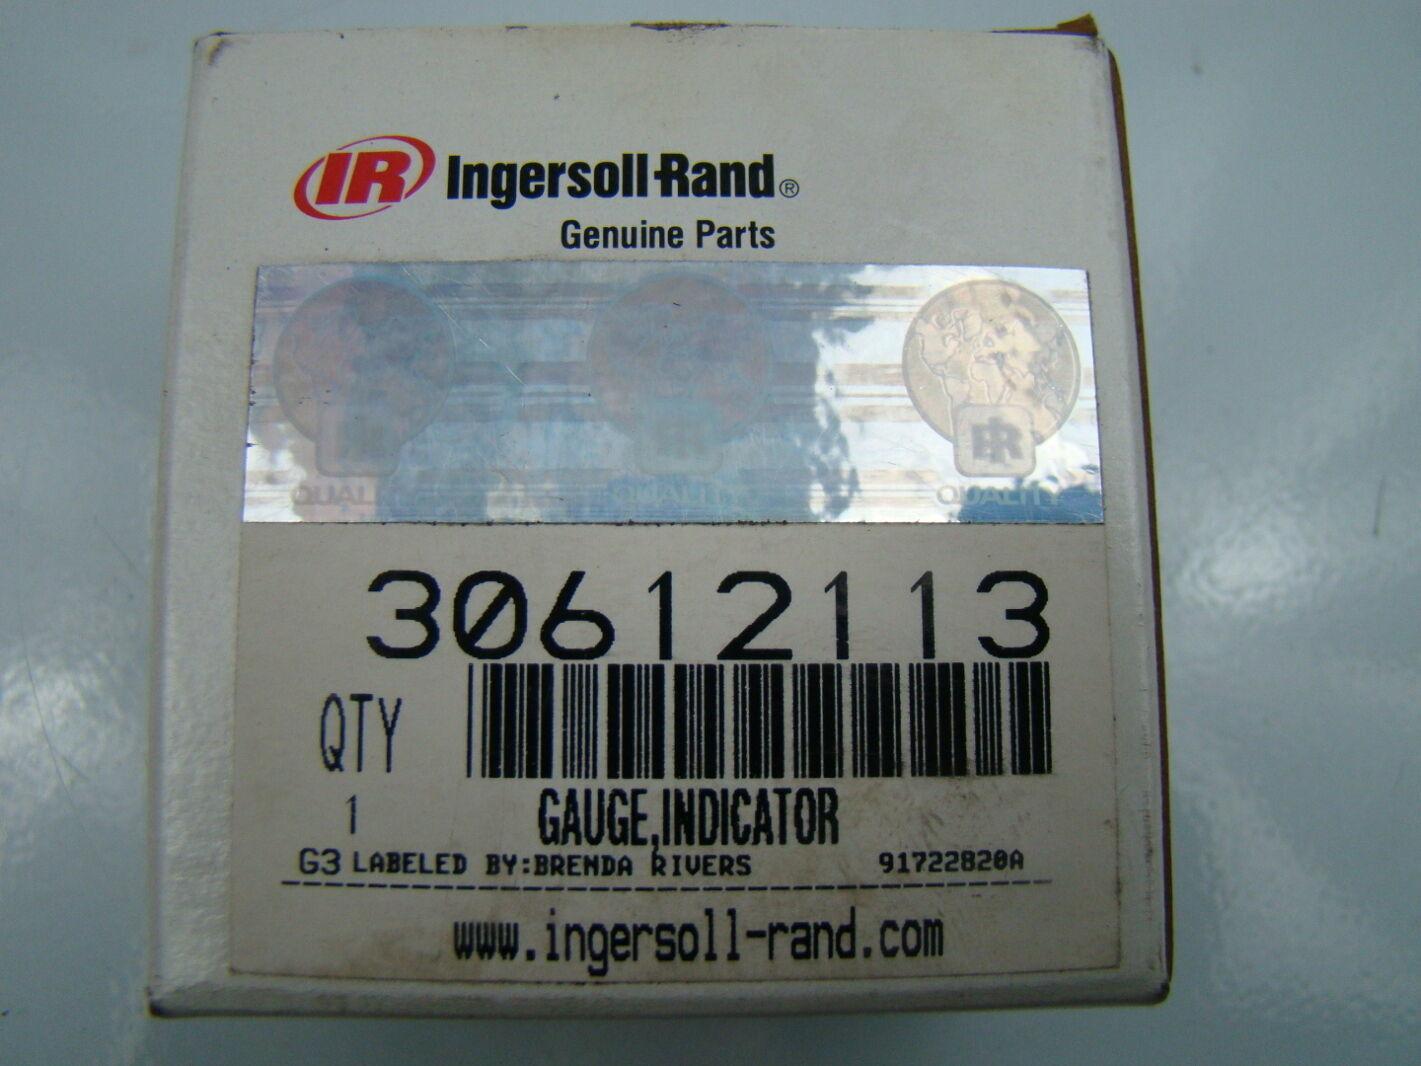 ir ingersoll rand gauge indicator 30612113 ebay